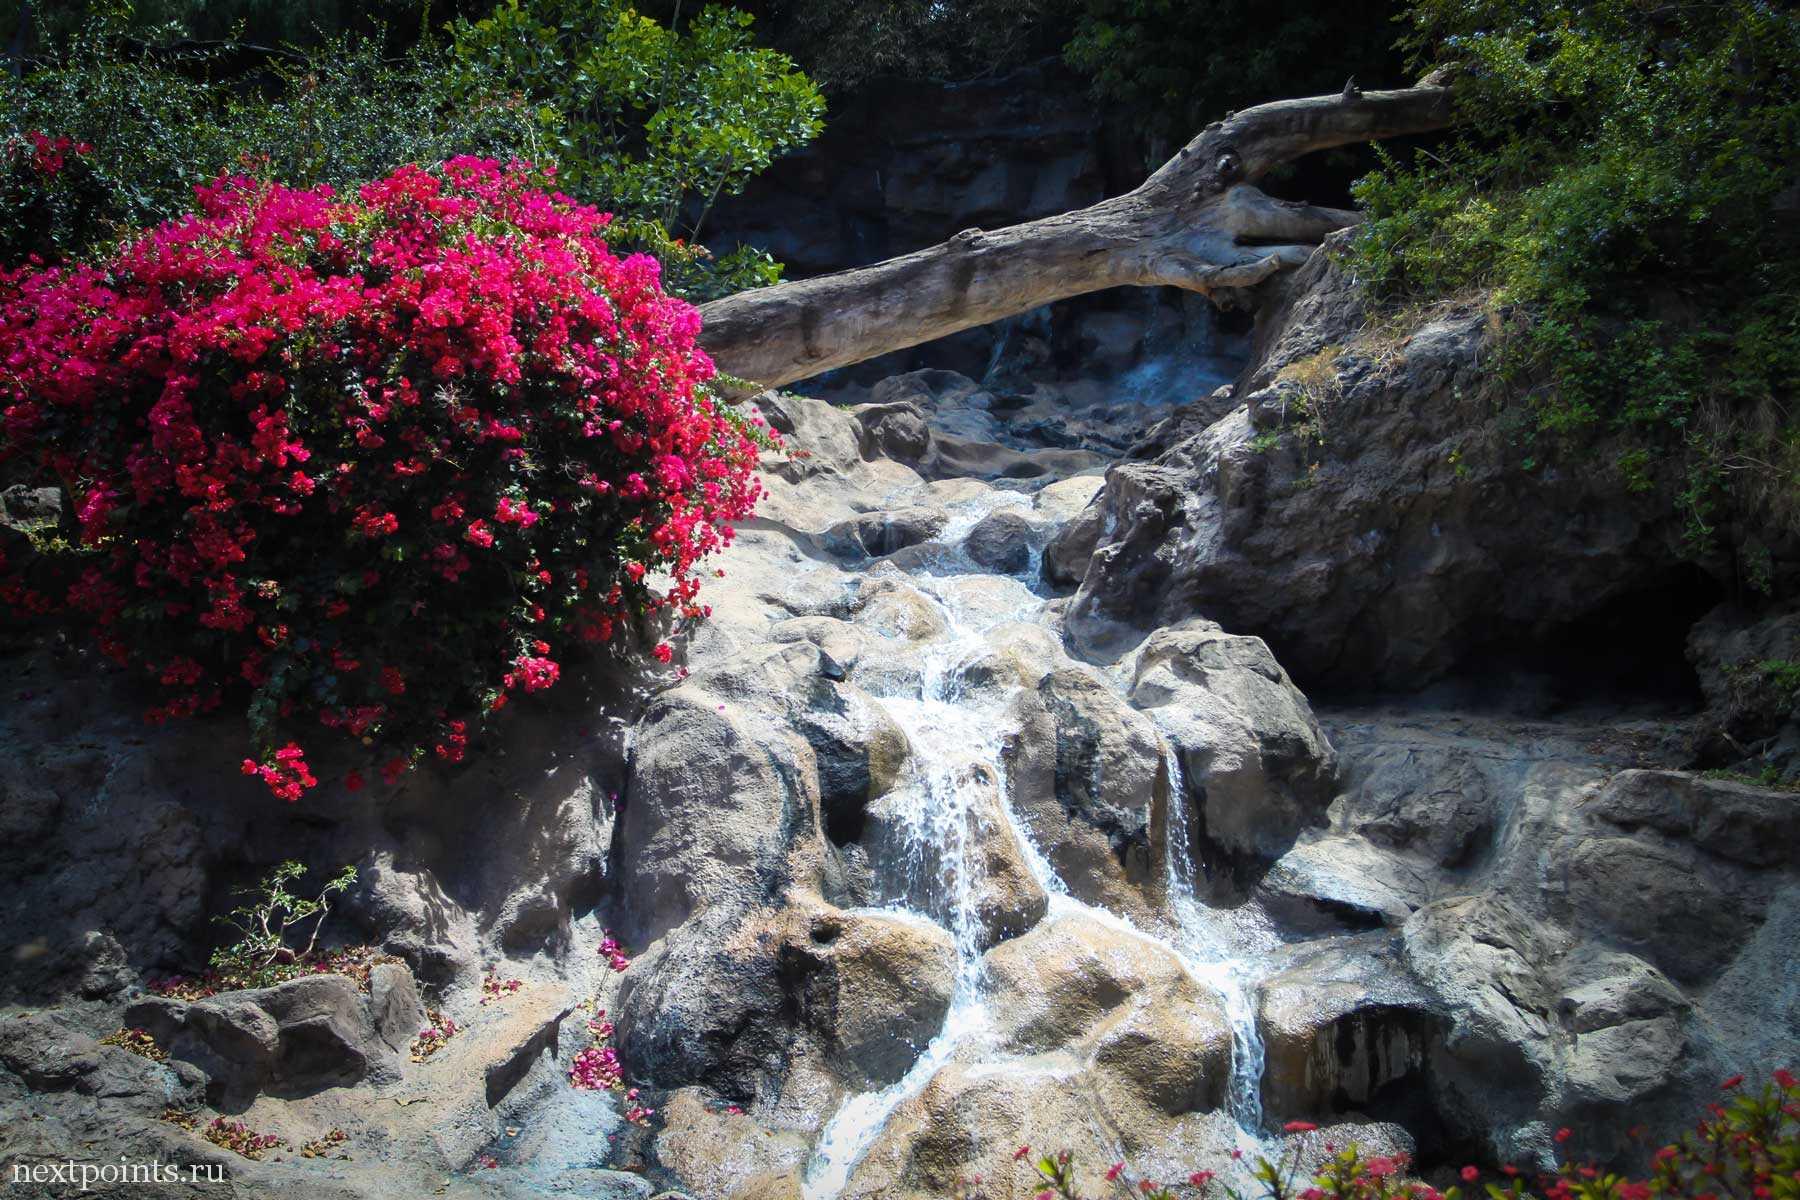 Водопад при входе в Лоро Парк